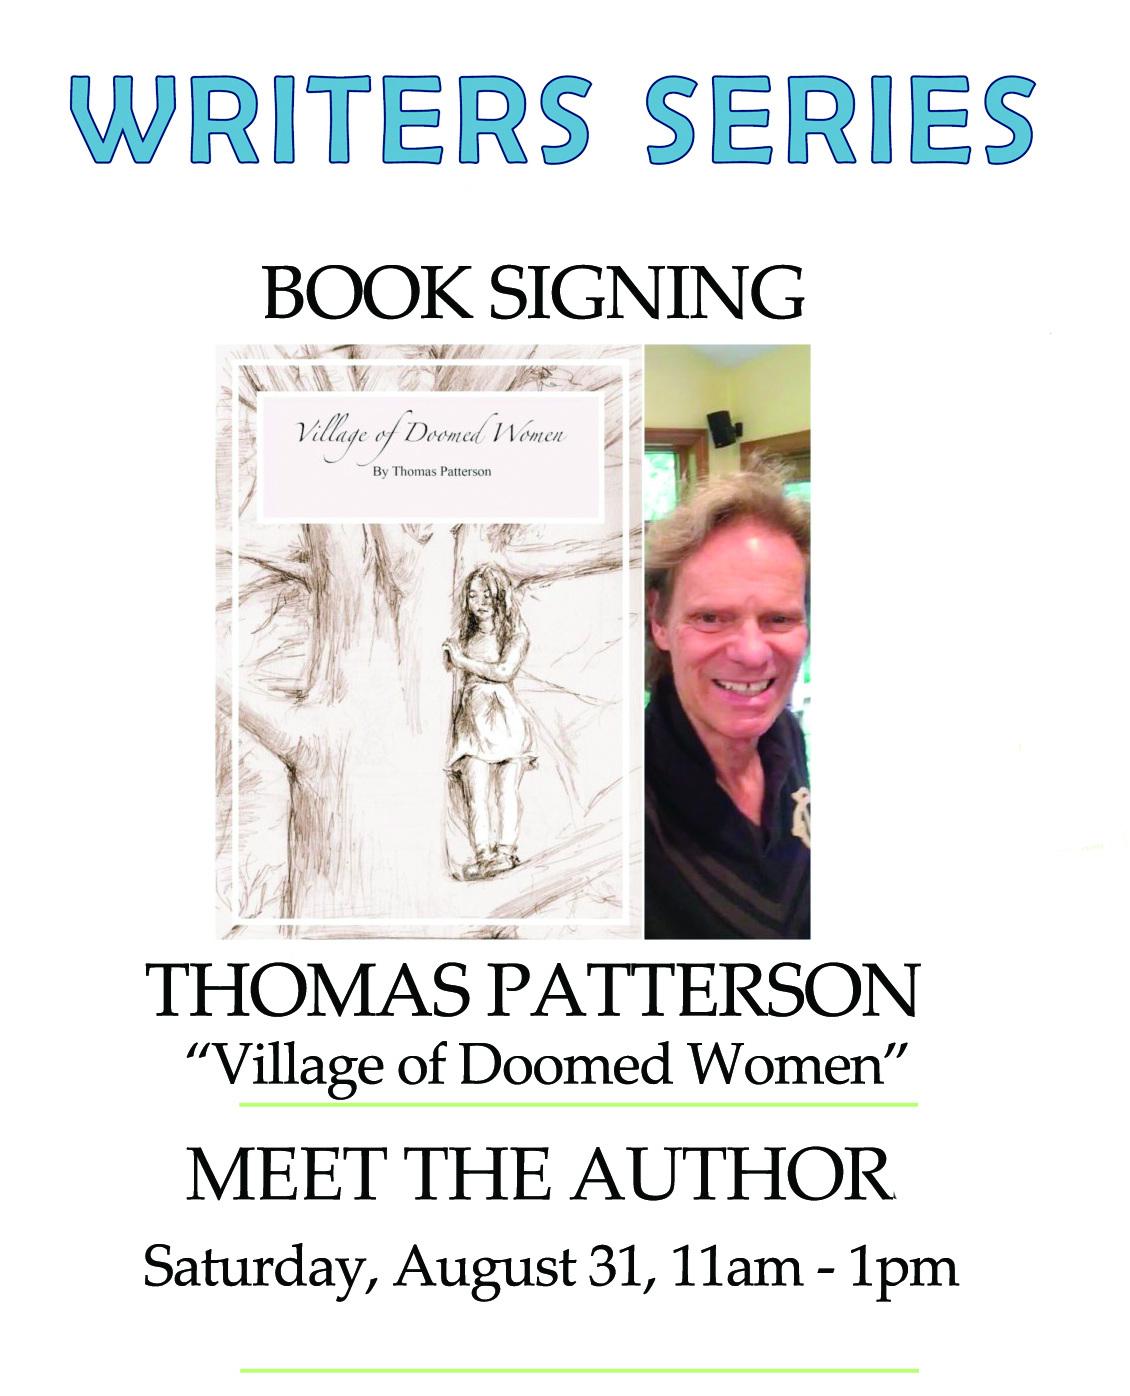 thomaspatterson_Booksigning.jpg